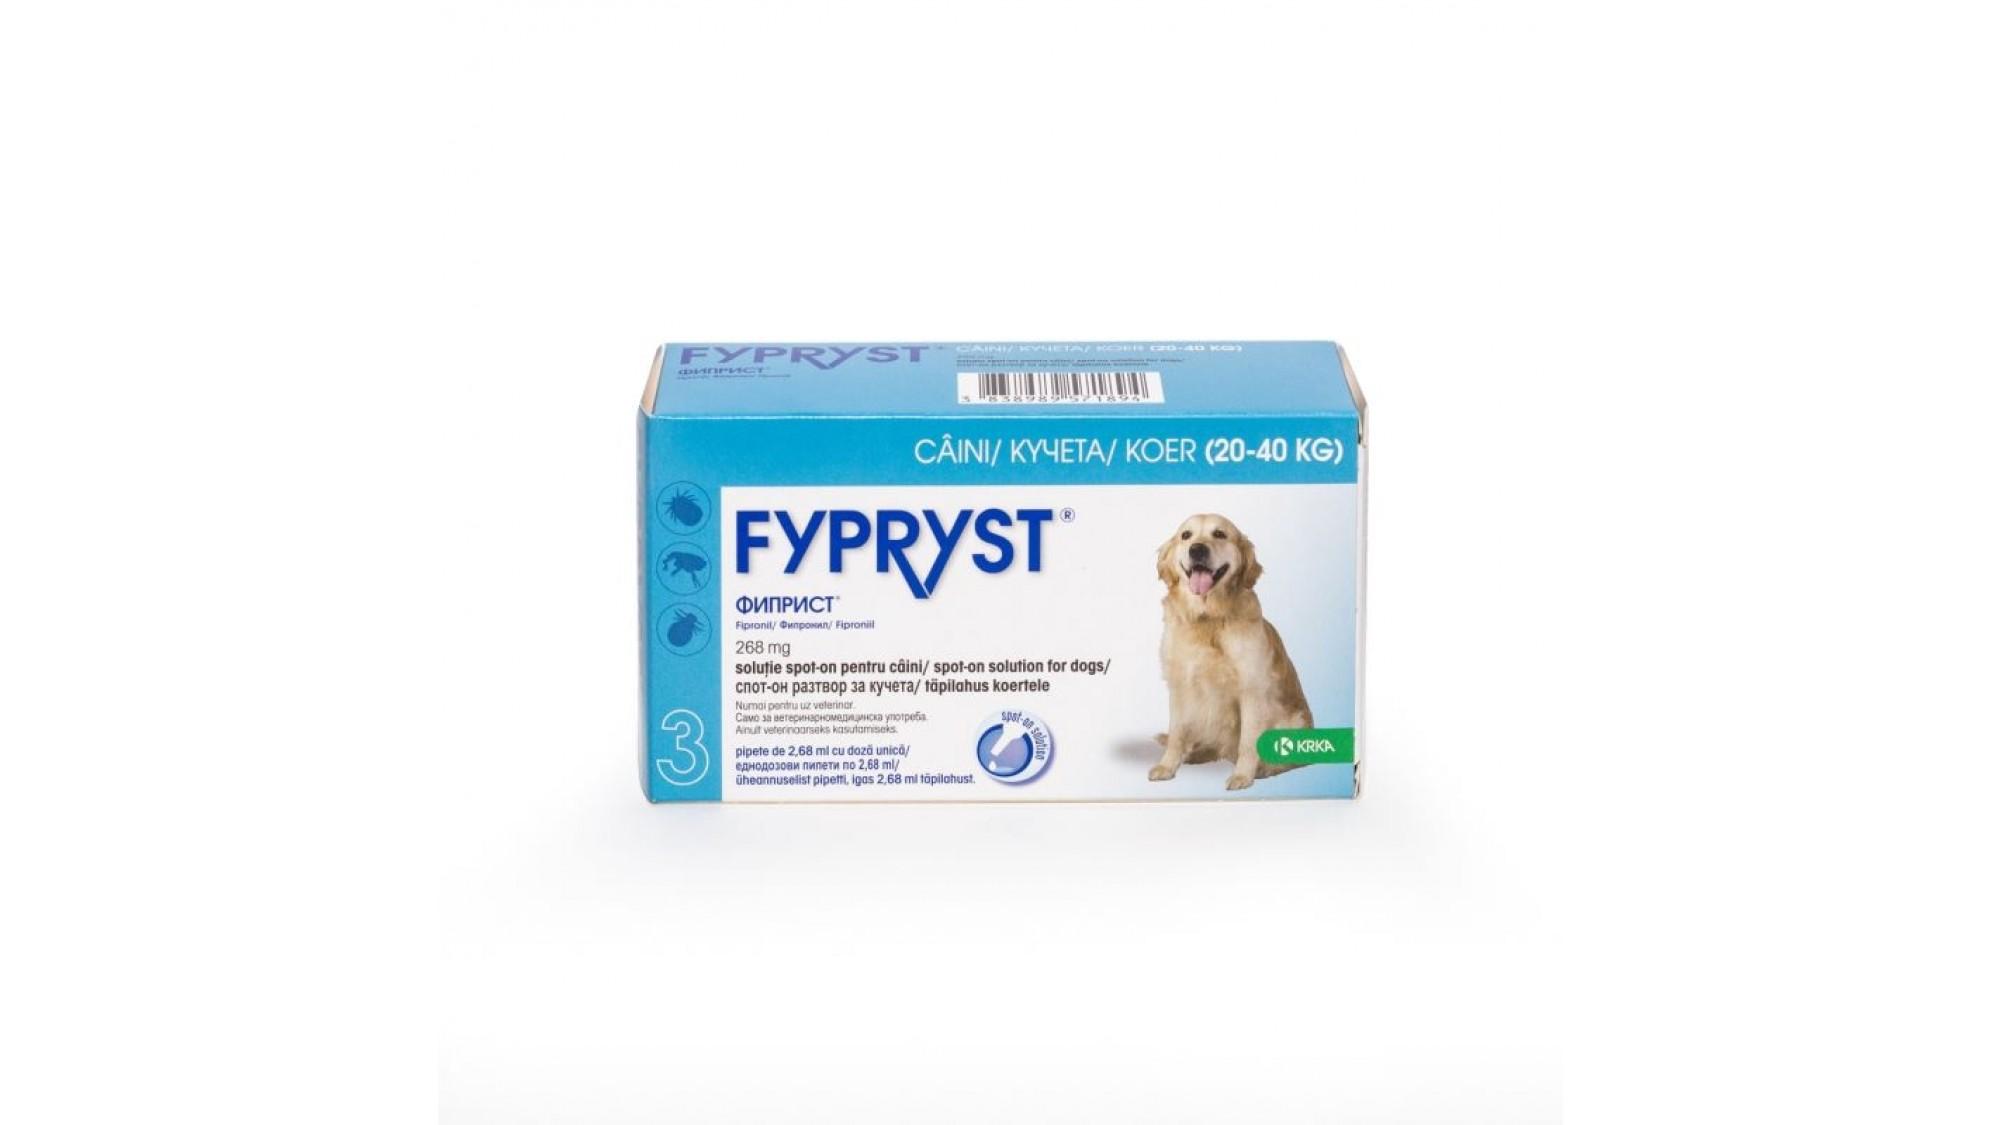 Fypryst Dog L 20-40 kg 1 Pipeta shop4pet.ro